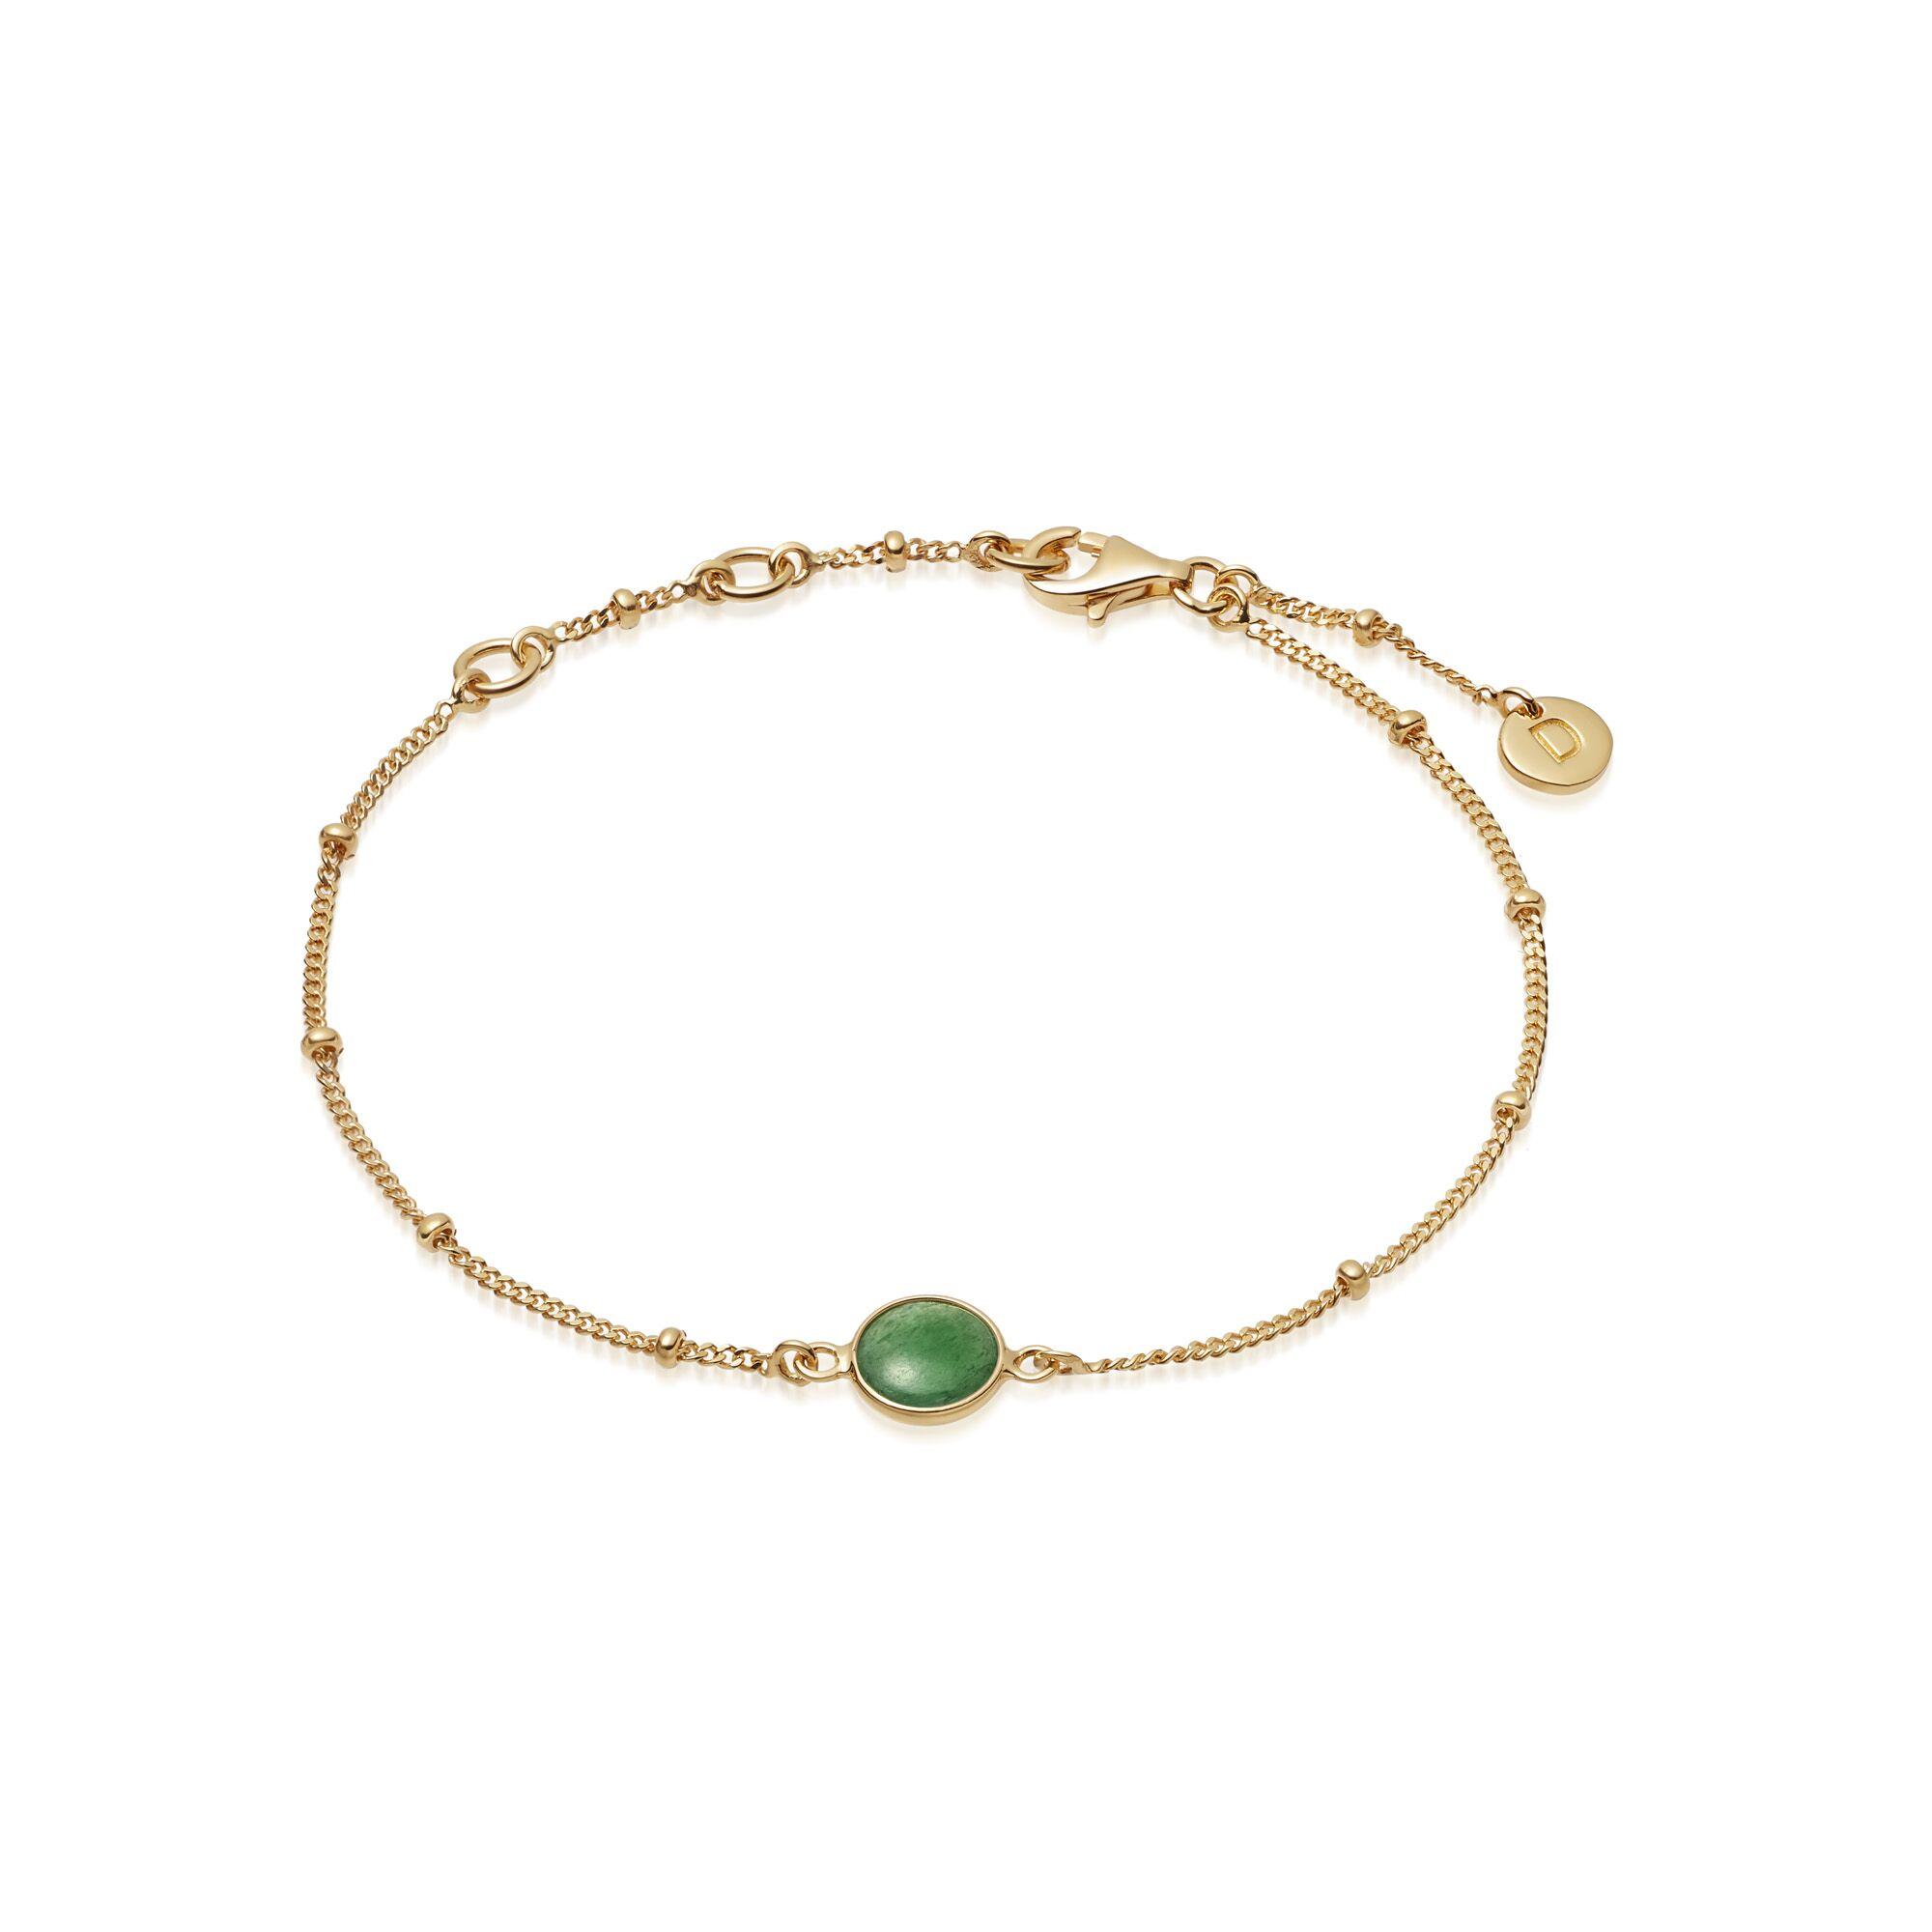 GREEN AVENTURINE HEALING BRACELET GOLD